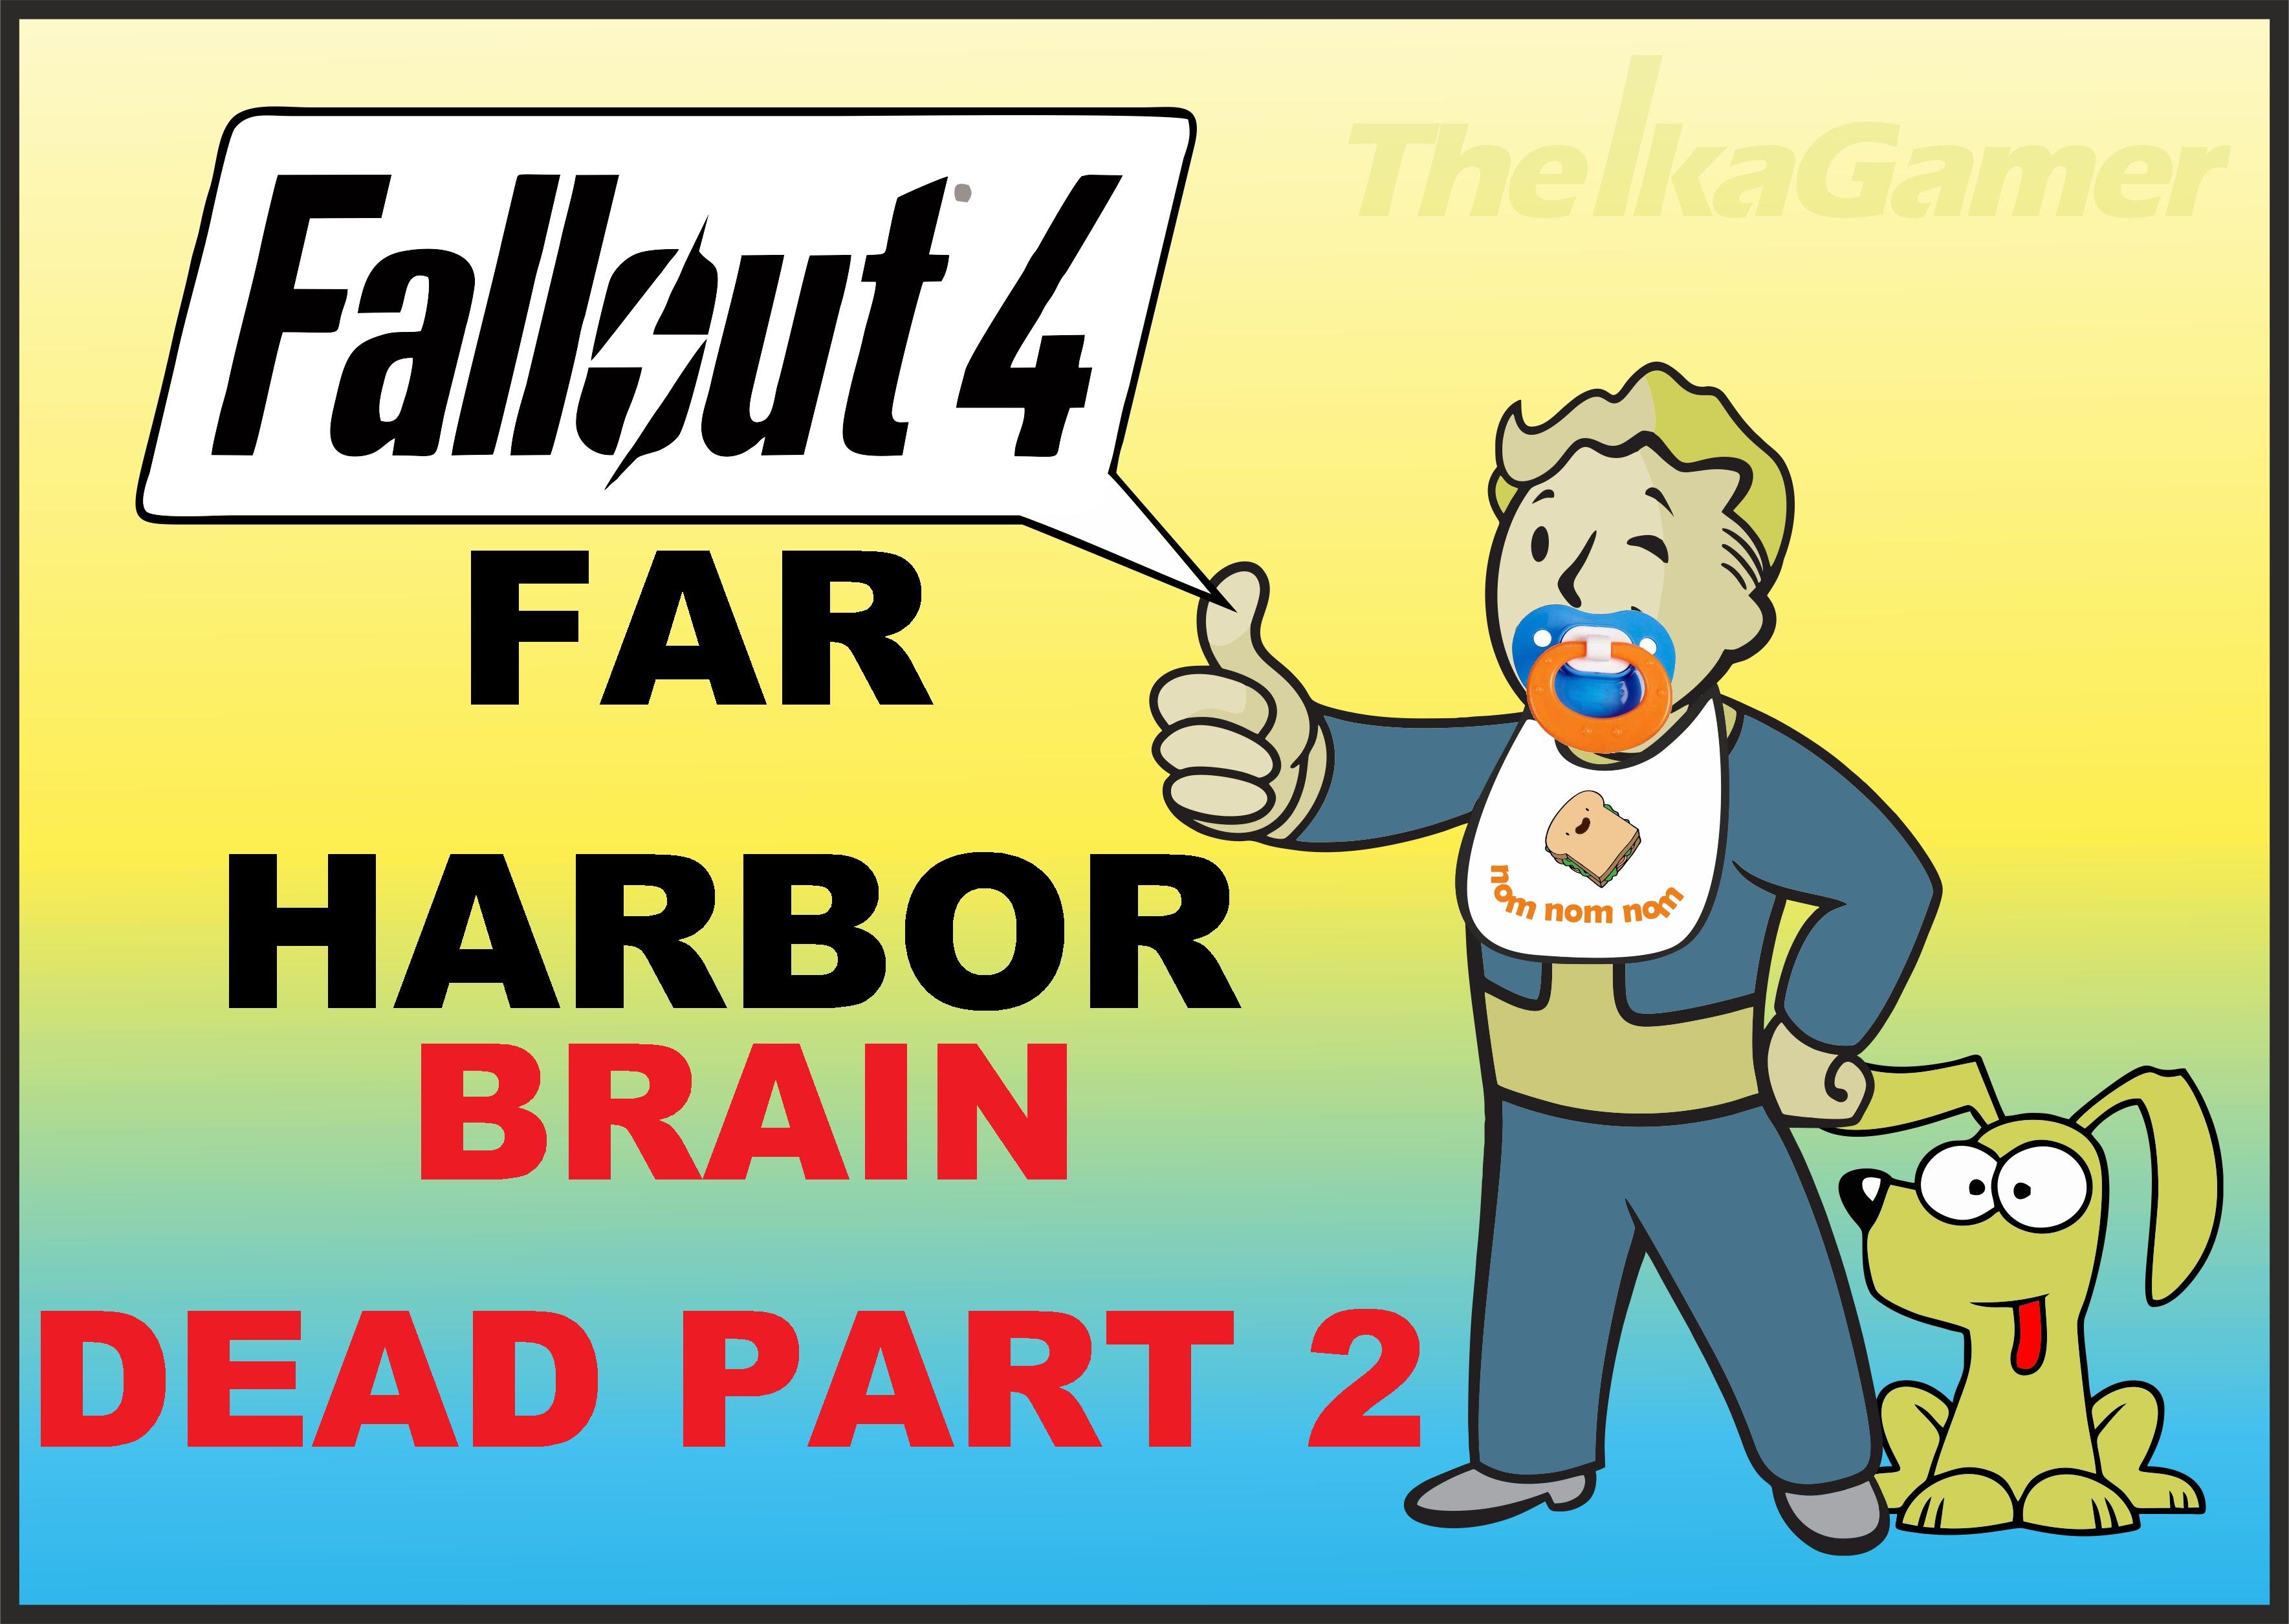 Fallout clipart dead FallOut Gameplay Dead PC 4:Far